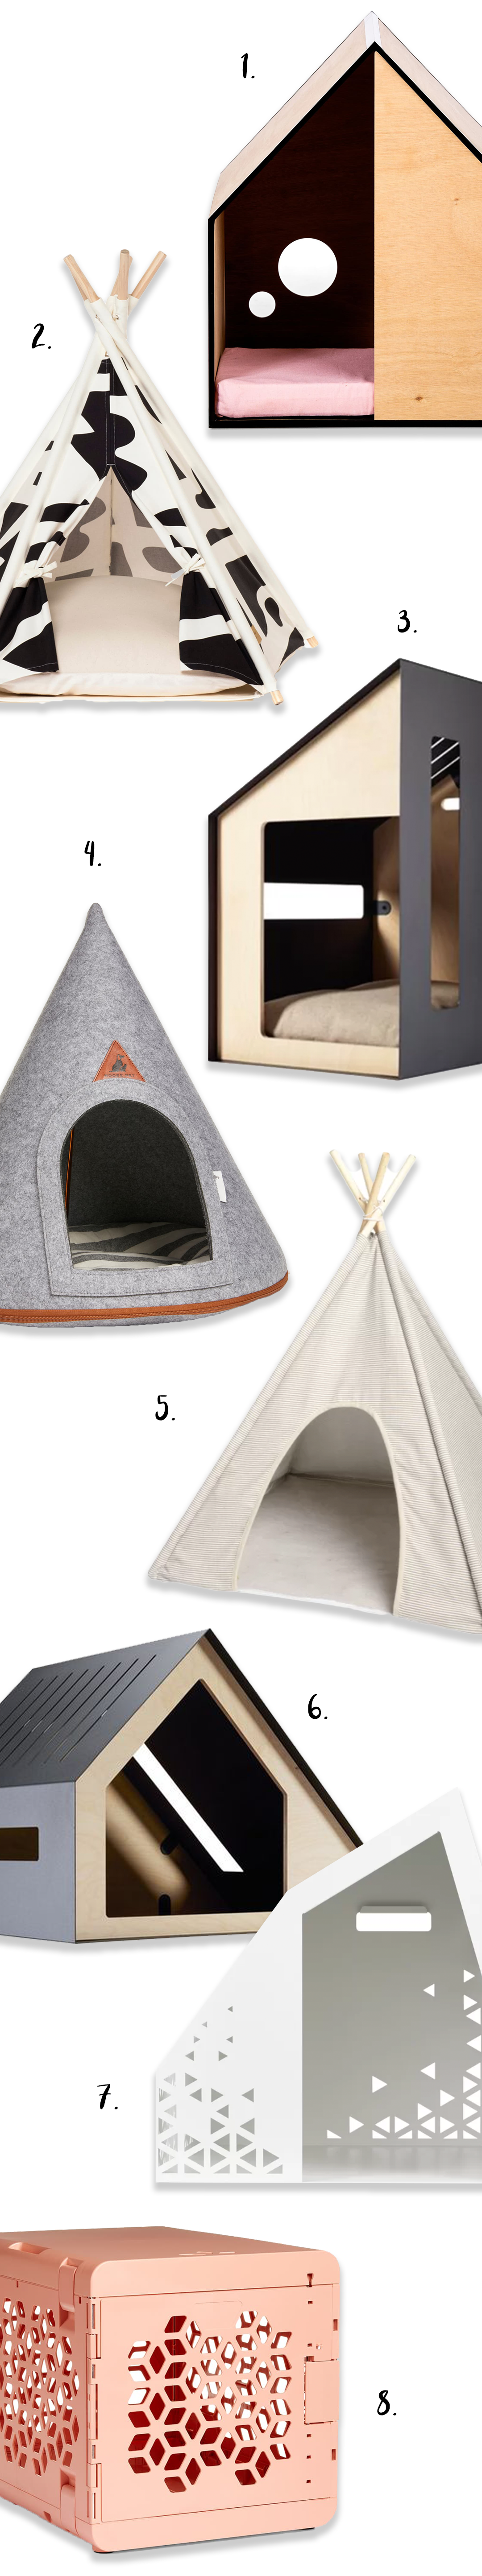 8 Modern Indoor Dog Dens for Stylish Pooches - heydjangles.com - luxury indoor dog houses, modern dog kennels, dog teepees.